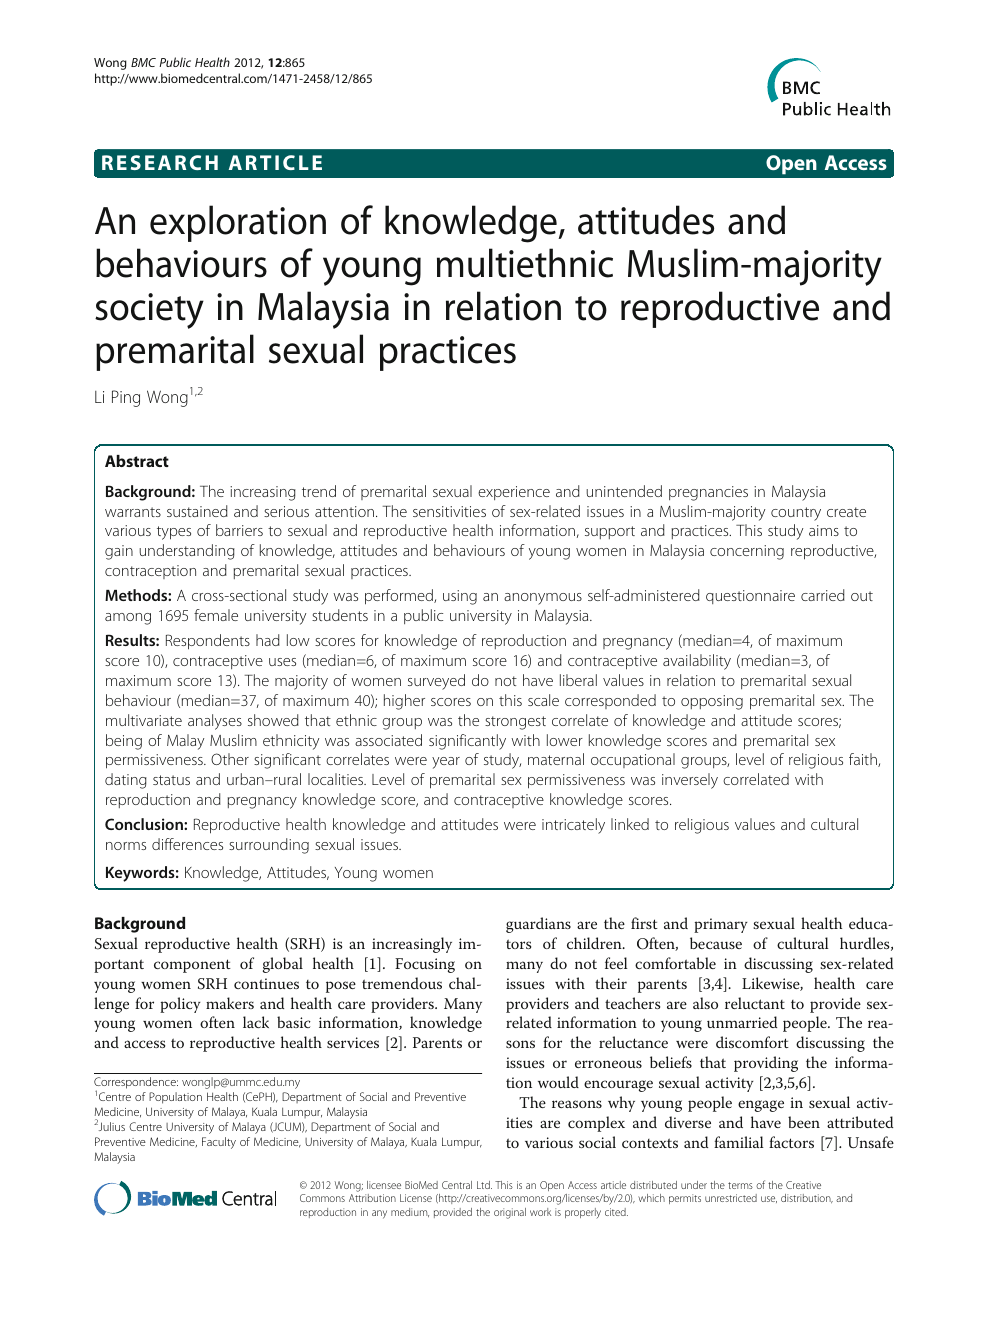 Premarital sexual attitudes and behaviour